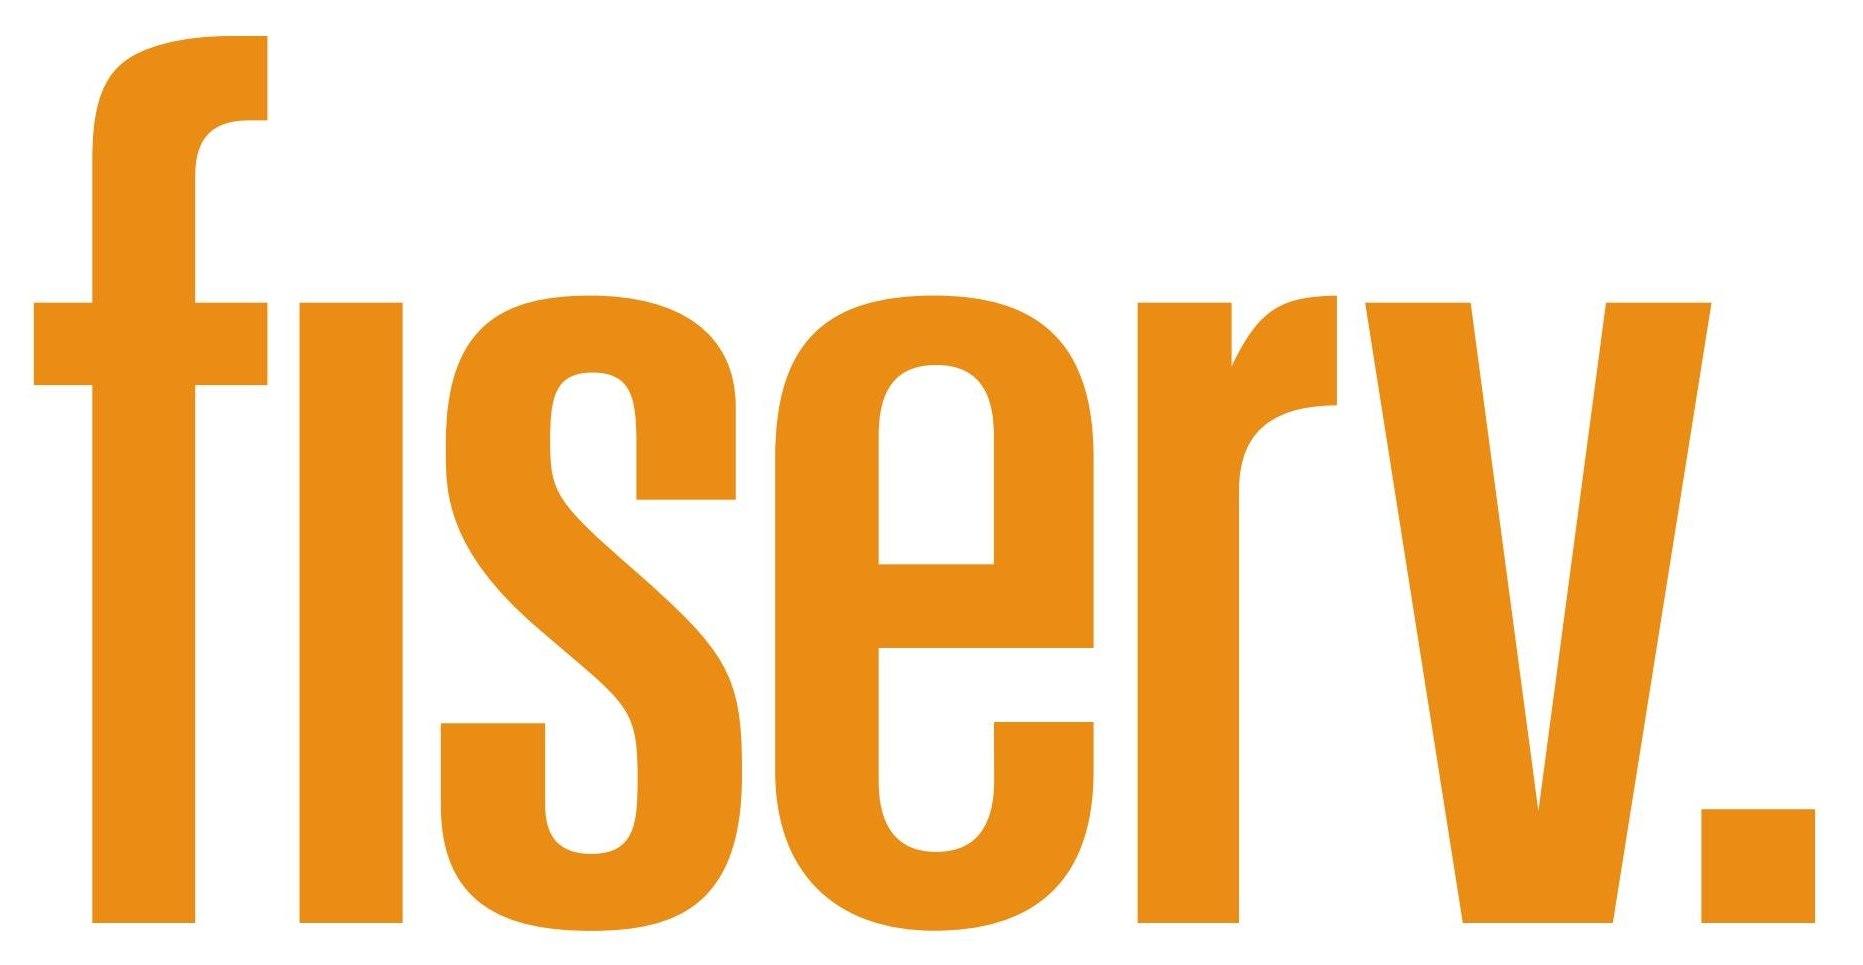 fiserv_logo